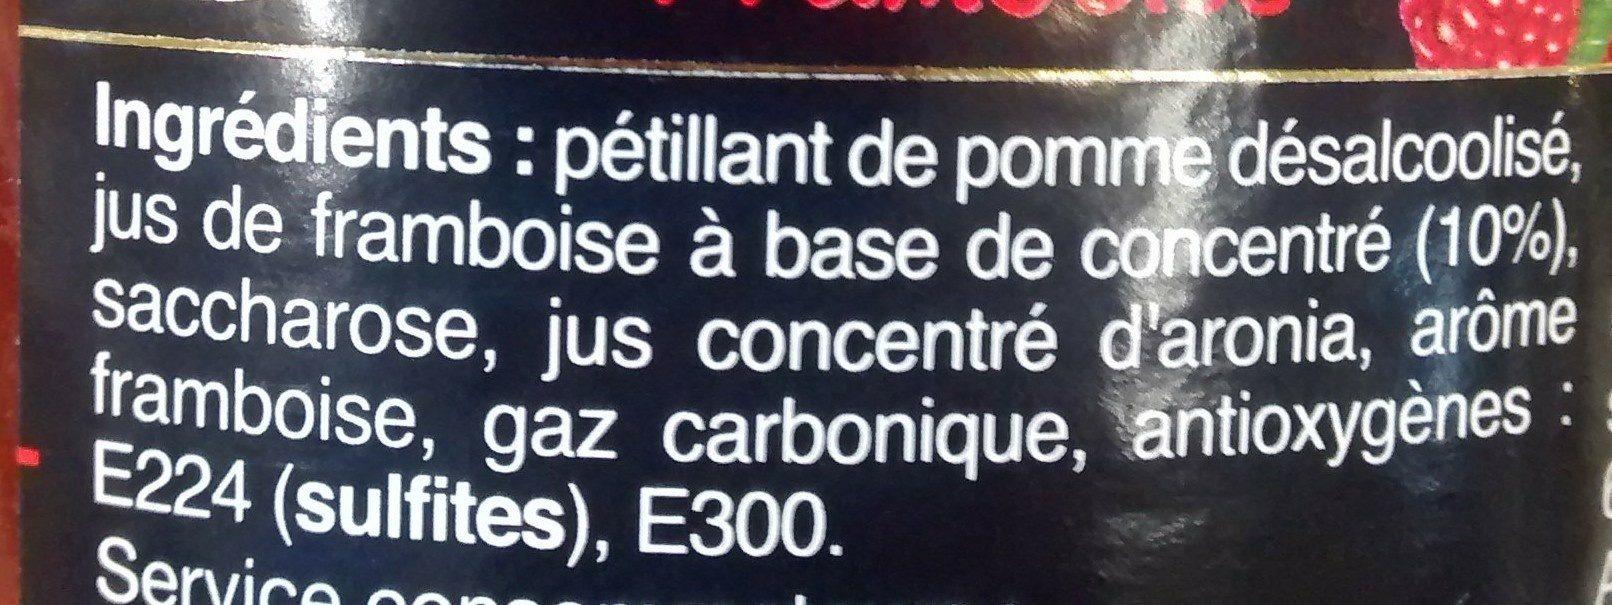 D'Artigny, Cocktail Royal, framboise - Ingrédients - fr